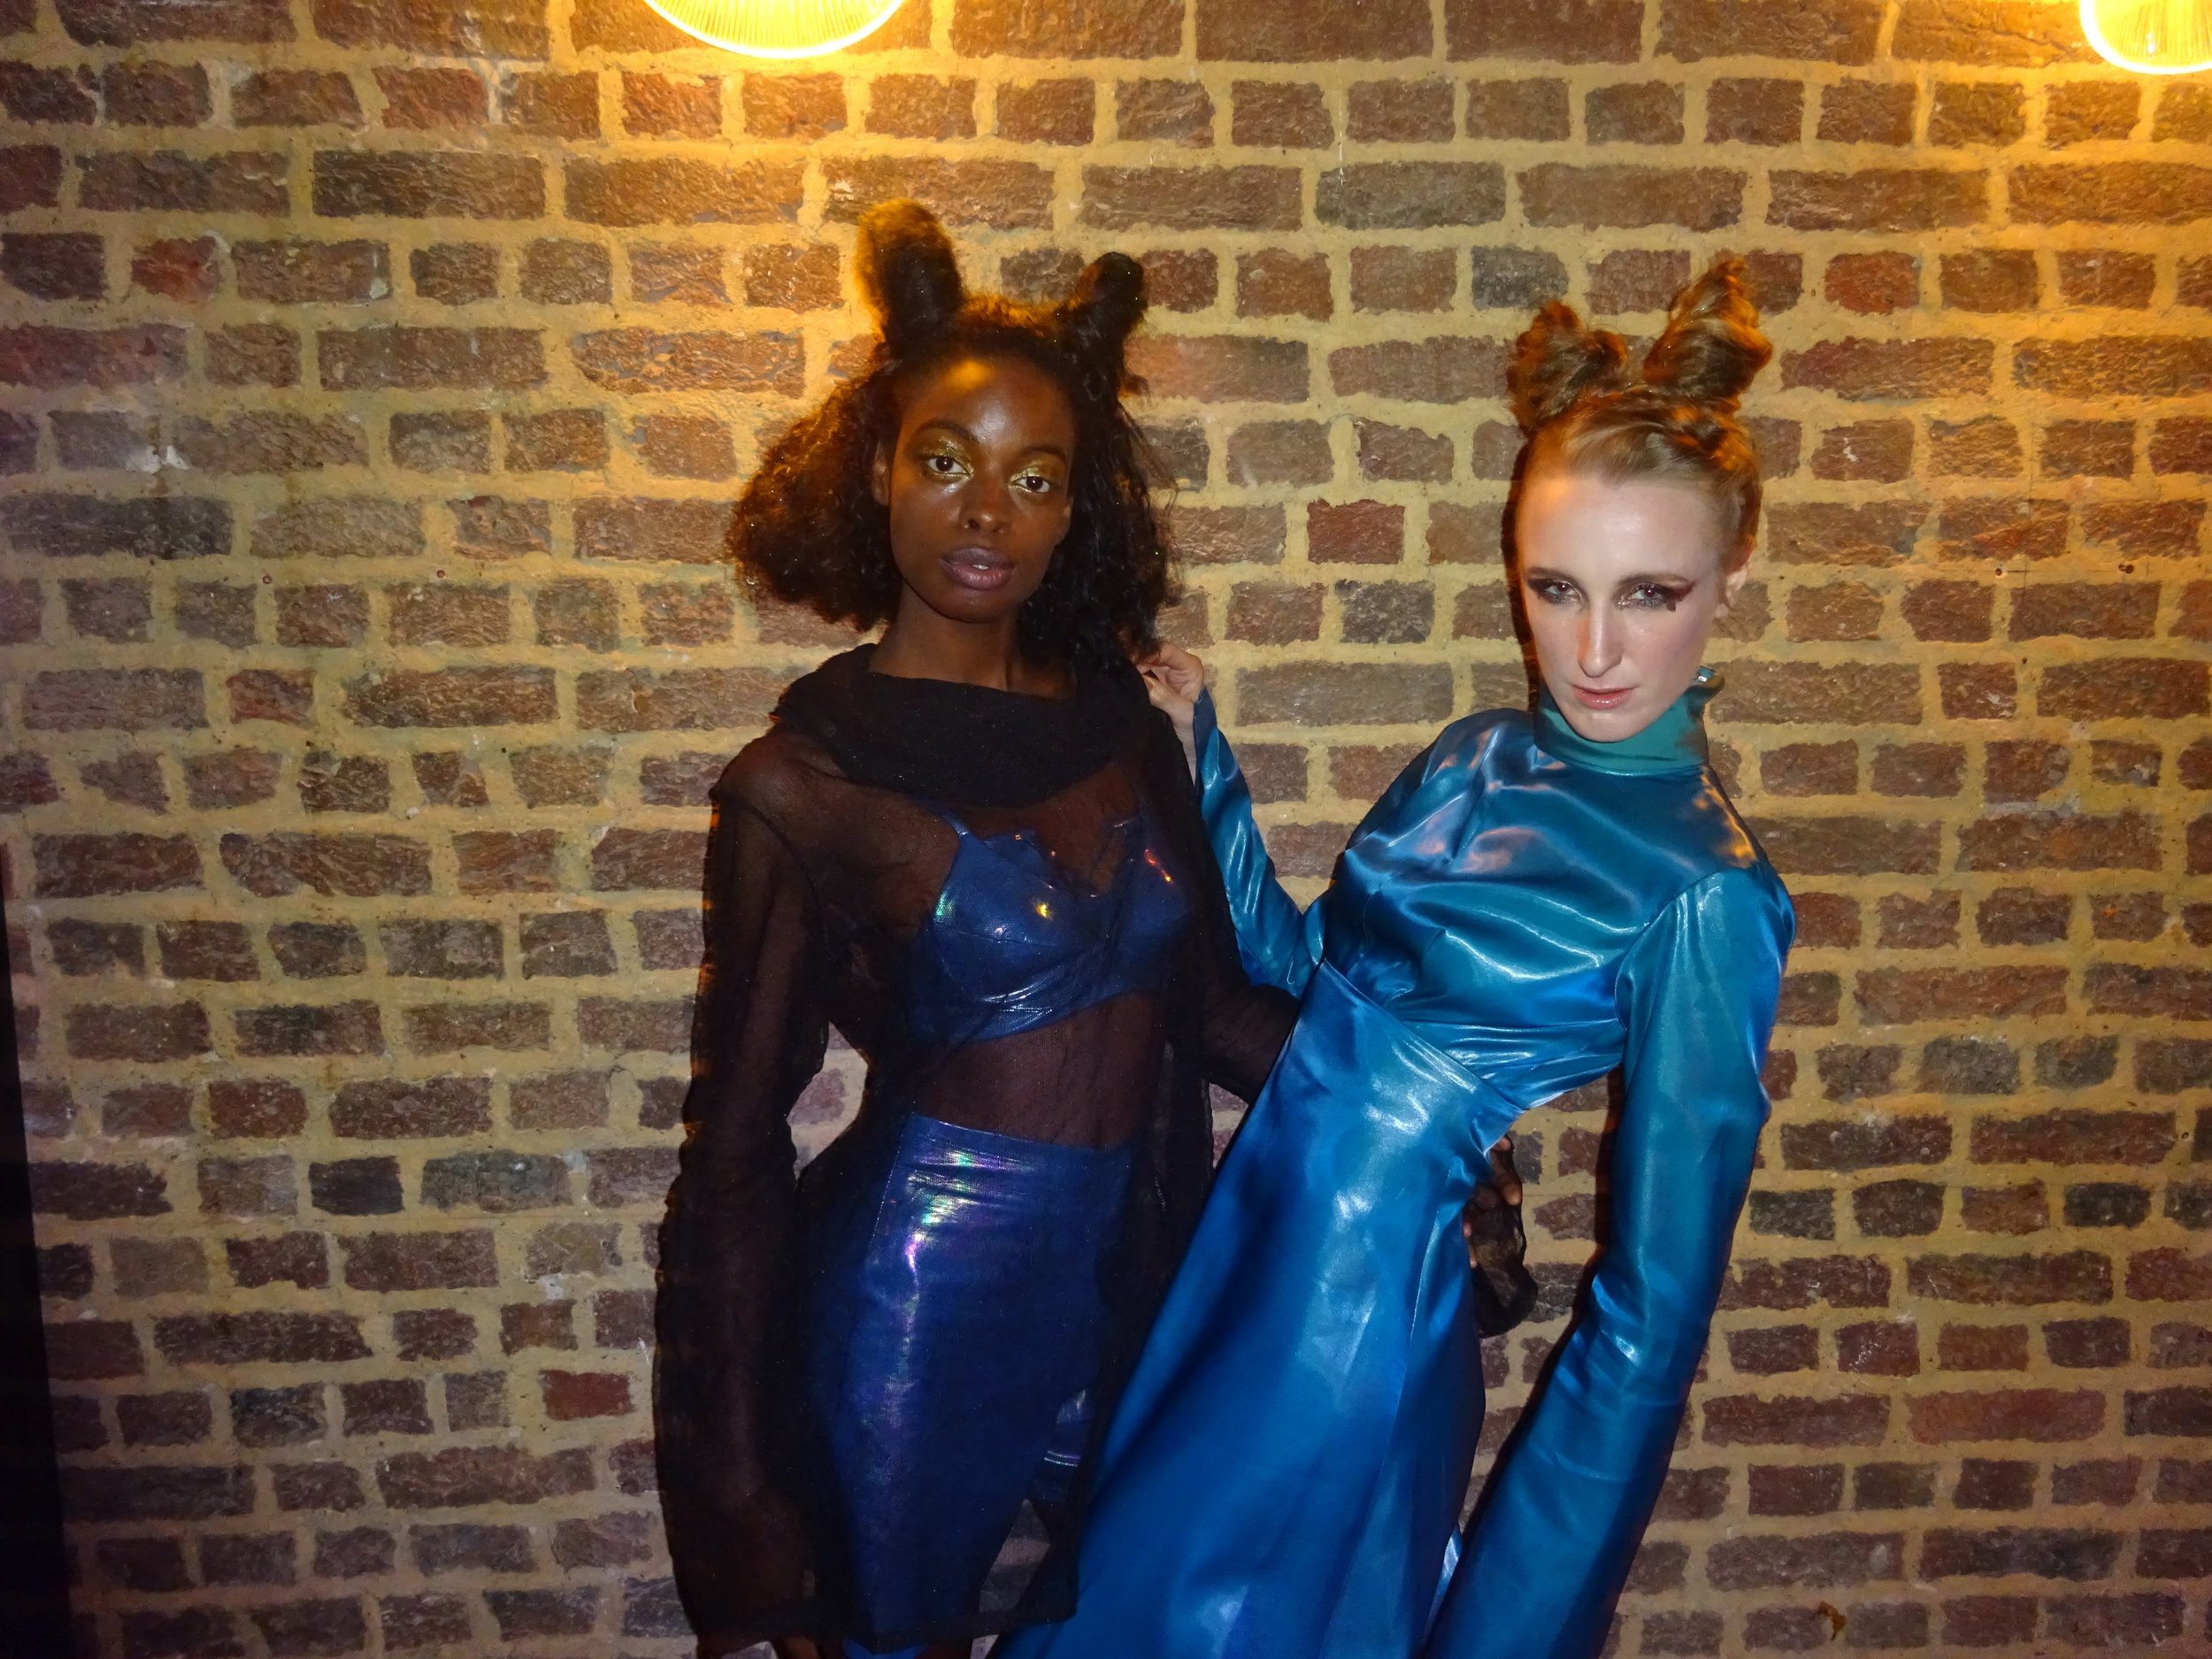 SUN, SEP 18 2016  SPACE GRUNGE GIRLS  MODELS FROM     KRAKENCOUNTERCOUNTERCOUTURE  RUNWAY   SHOW   LONDON, ENGLAND